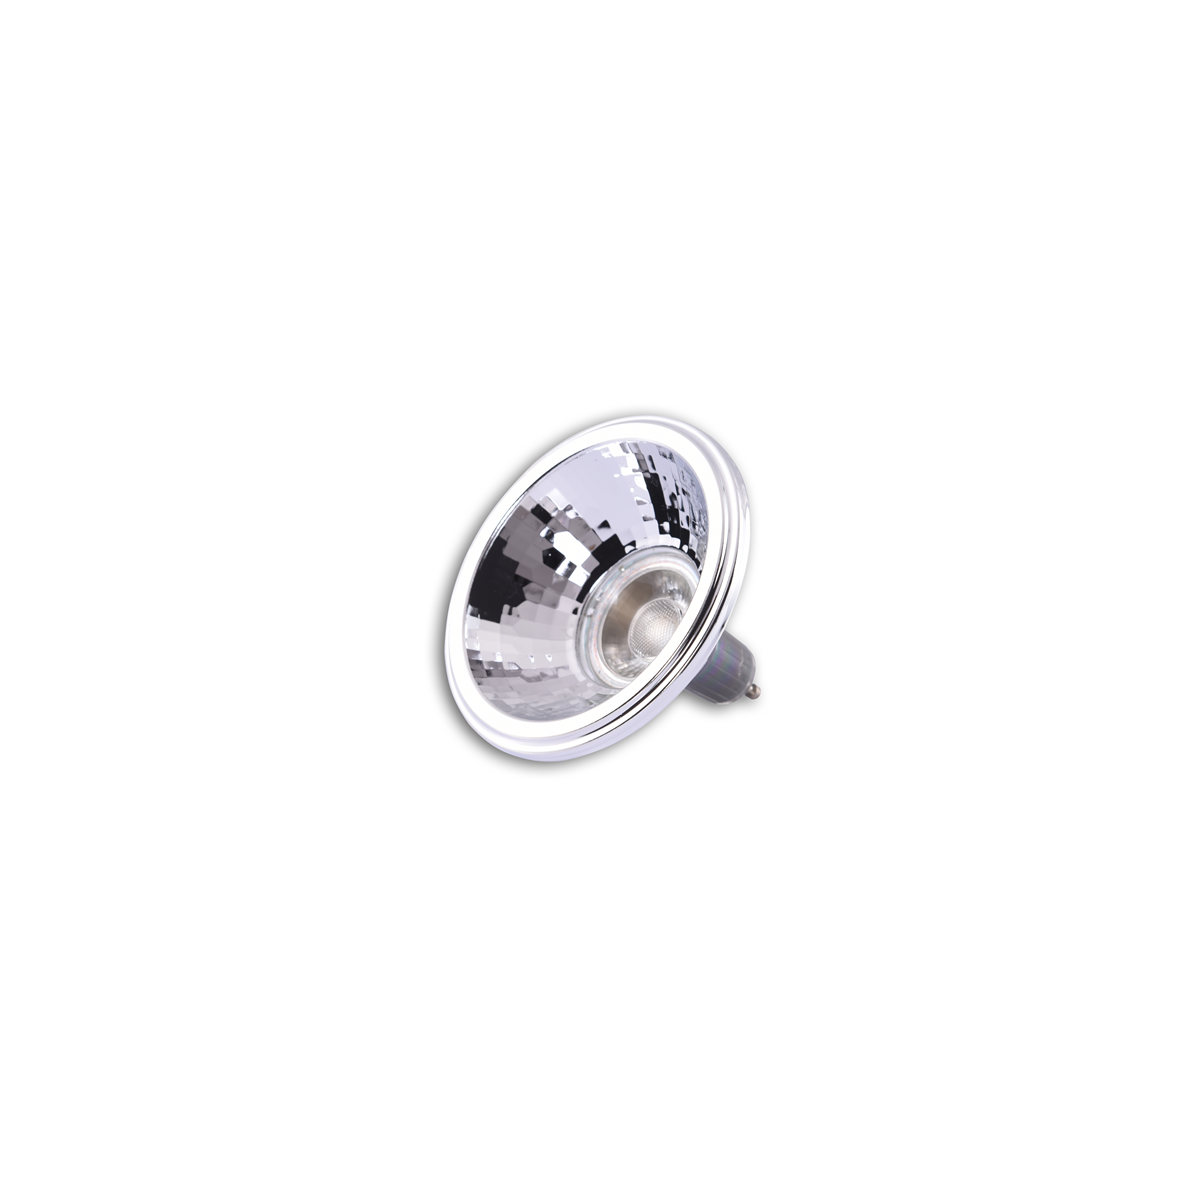 AZzardo Adapter do źrodła światła PAR16 na ES111/AR111 AZ1117